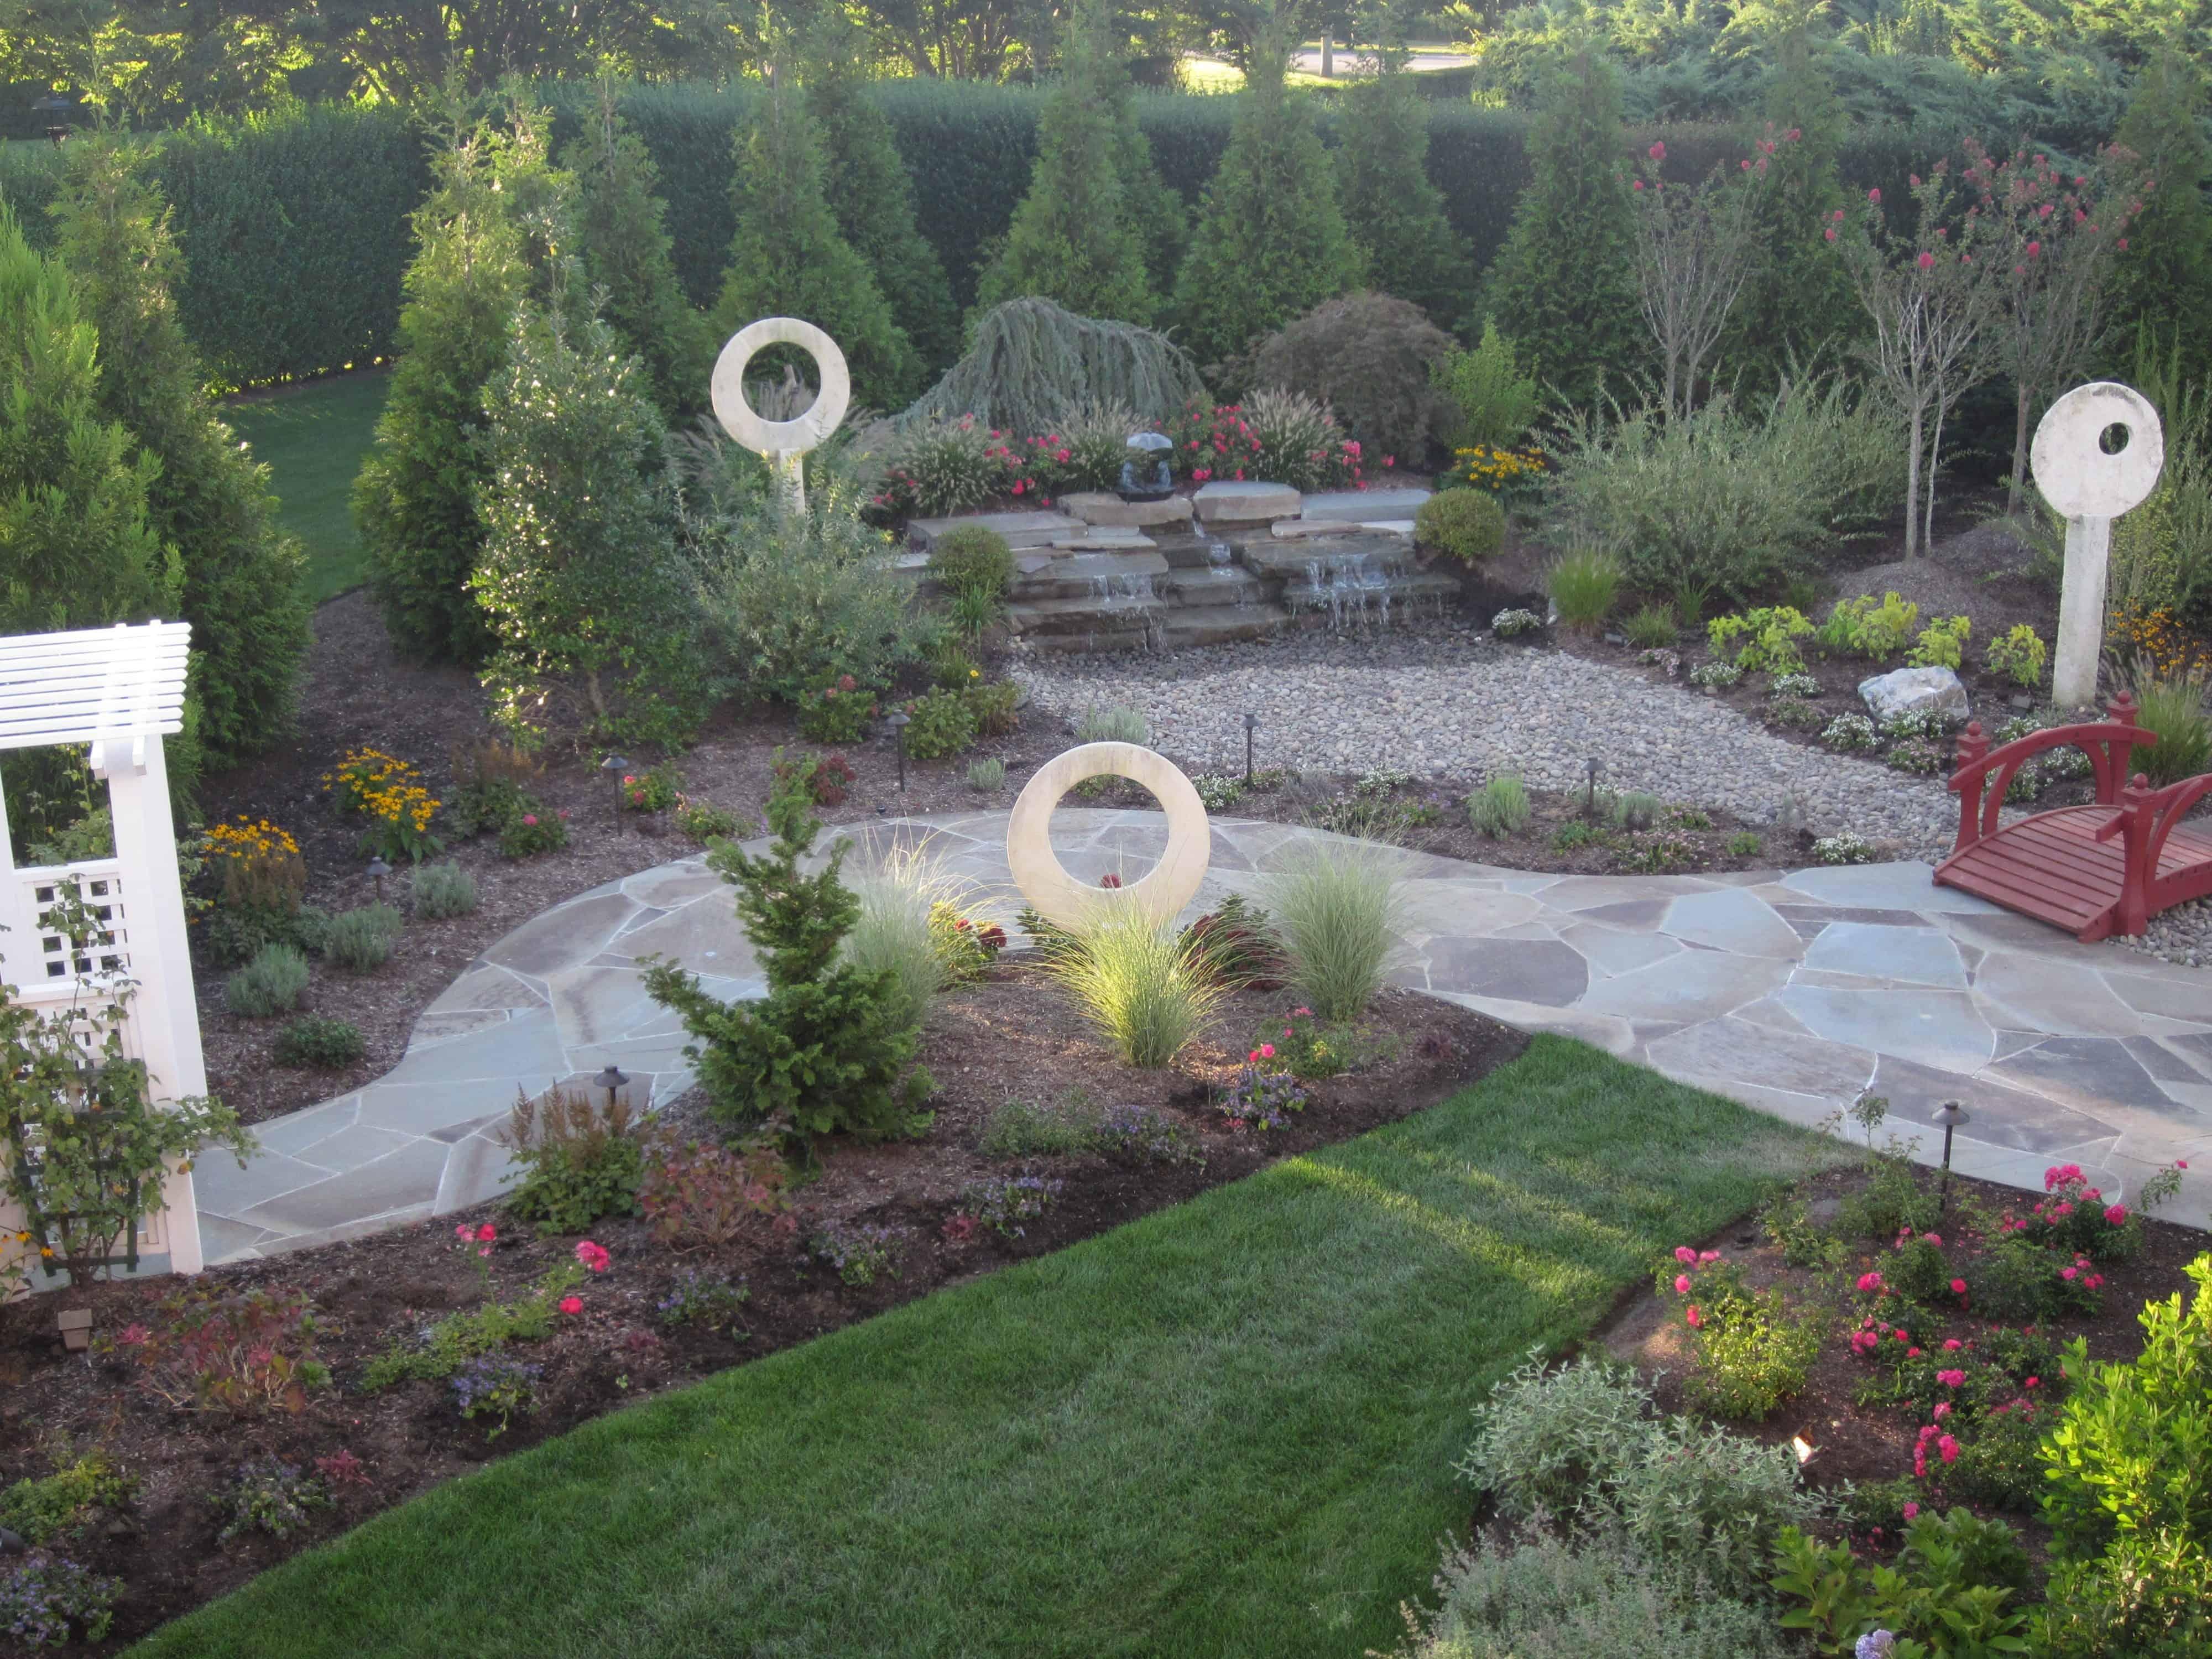 Landscape Plantings - Mixed Evergreens and Perennials - Southampton, Long Island NY